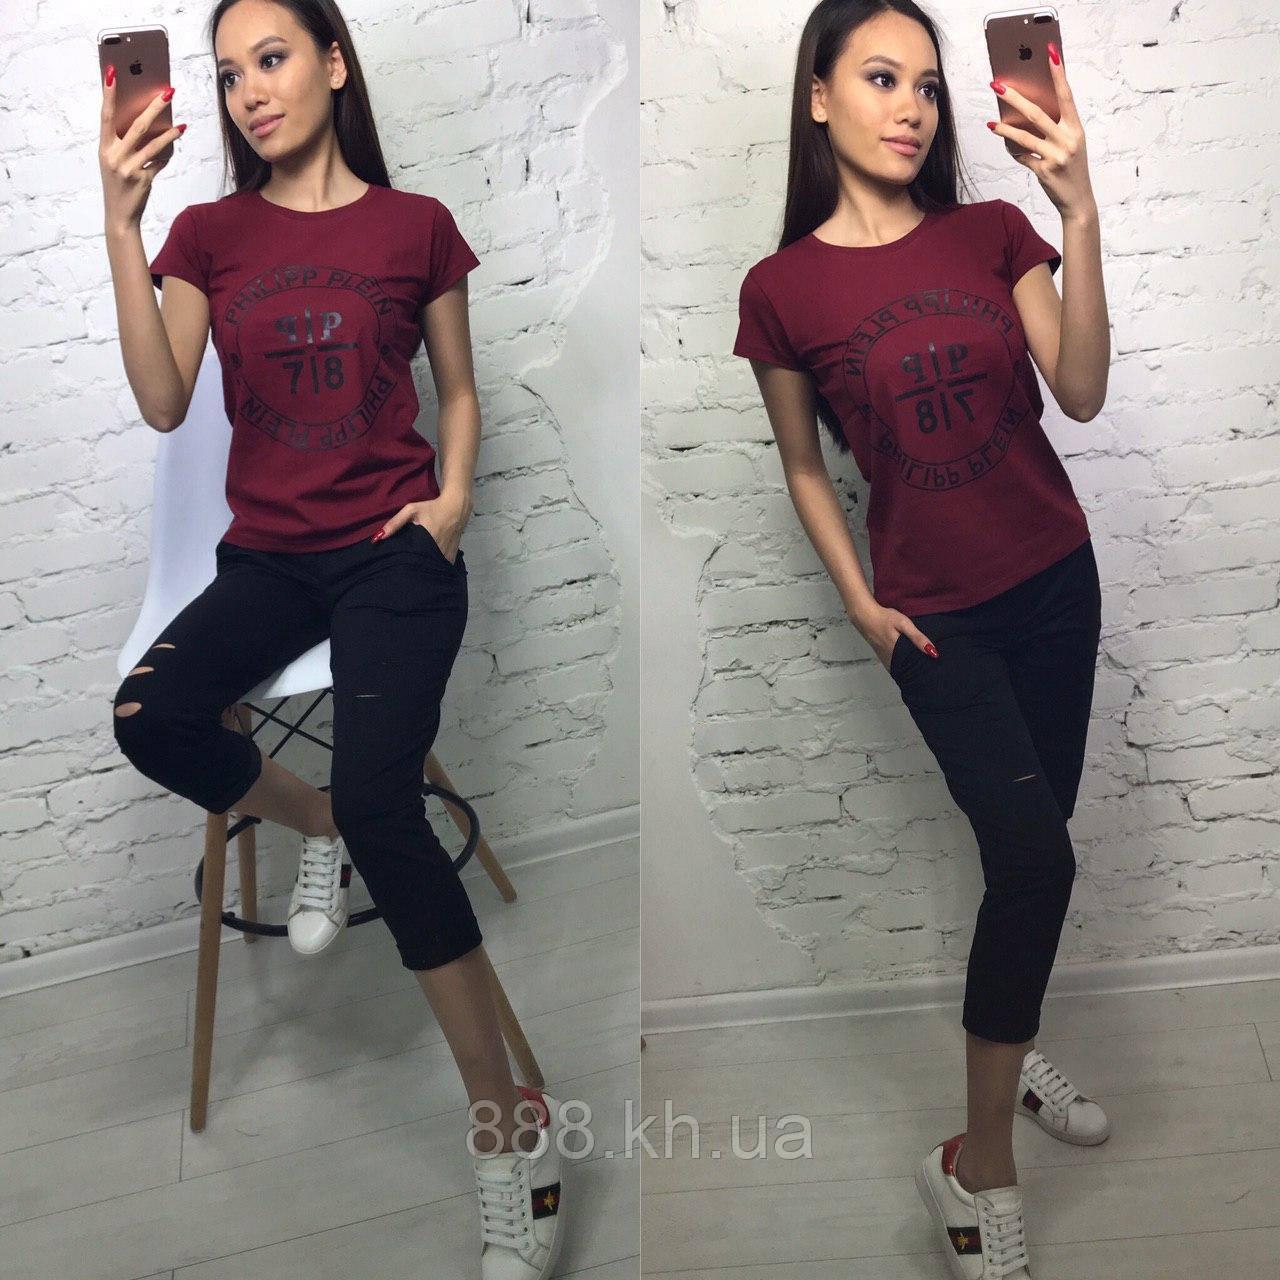 Стильная удобная футболка, турецкий трикотаж S/M/L/XL